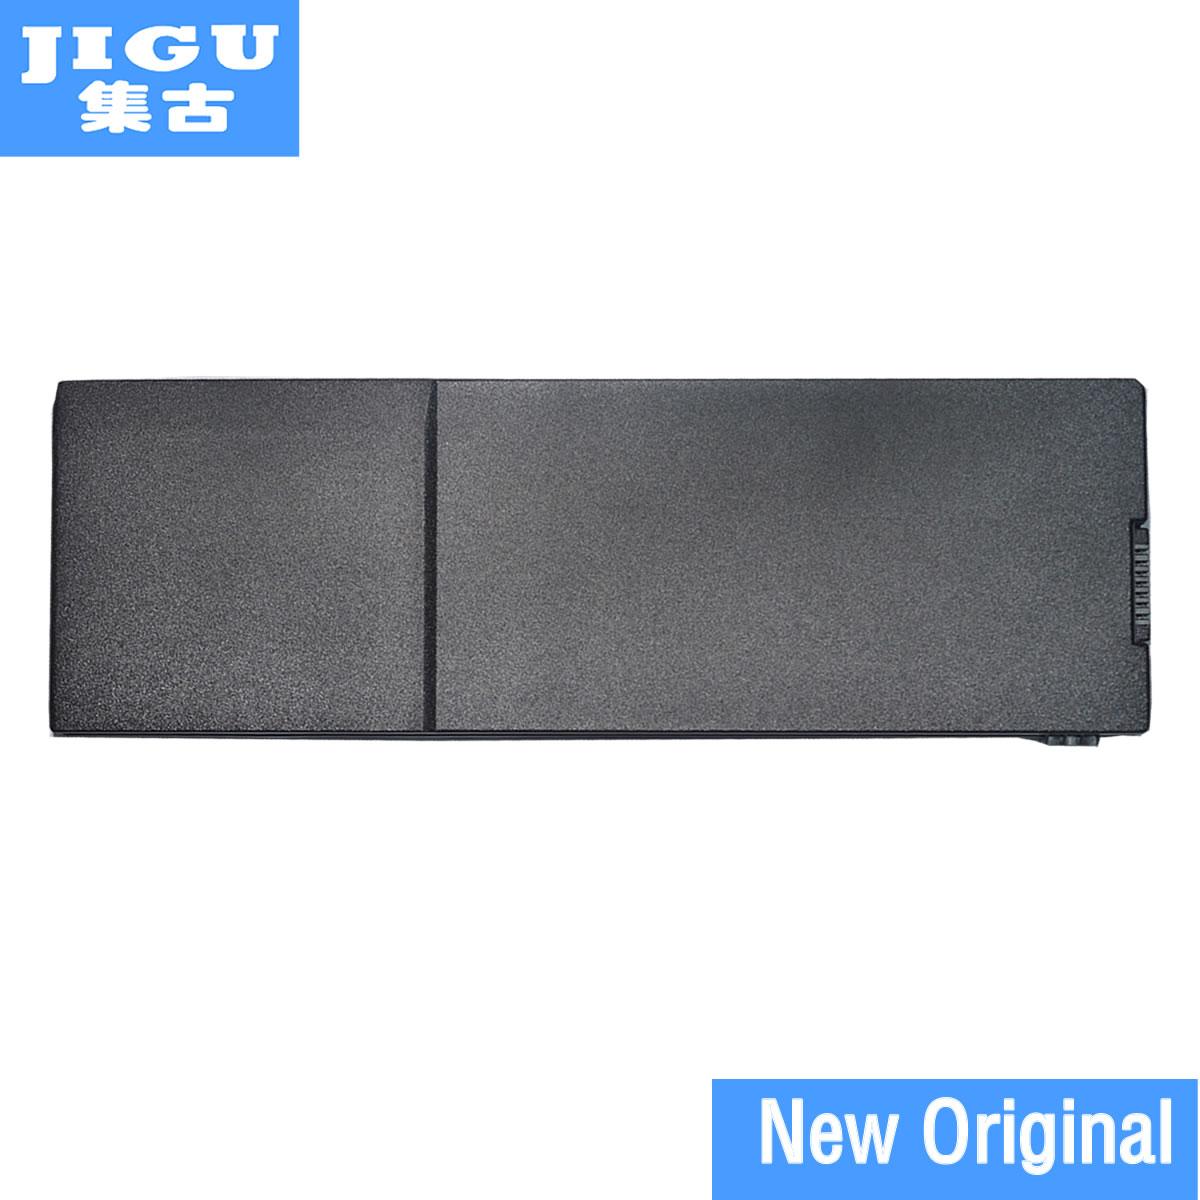 JIGU VGP-BPS24 Original laptop Battery For SONY for vaio PCG-4100 SVS15 SVS13 SVS13A SVT13 SVT14 VPC-SA SB VPC-SD VPC-SE jigu l09n8t22 l09n8y22 l09p8y22 lo9p8y22 original laptop battery for lenovo ideapad u460 14 4v 64wh